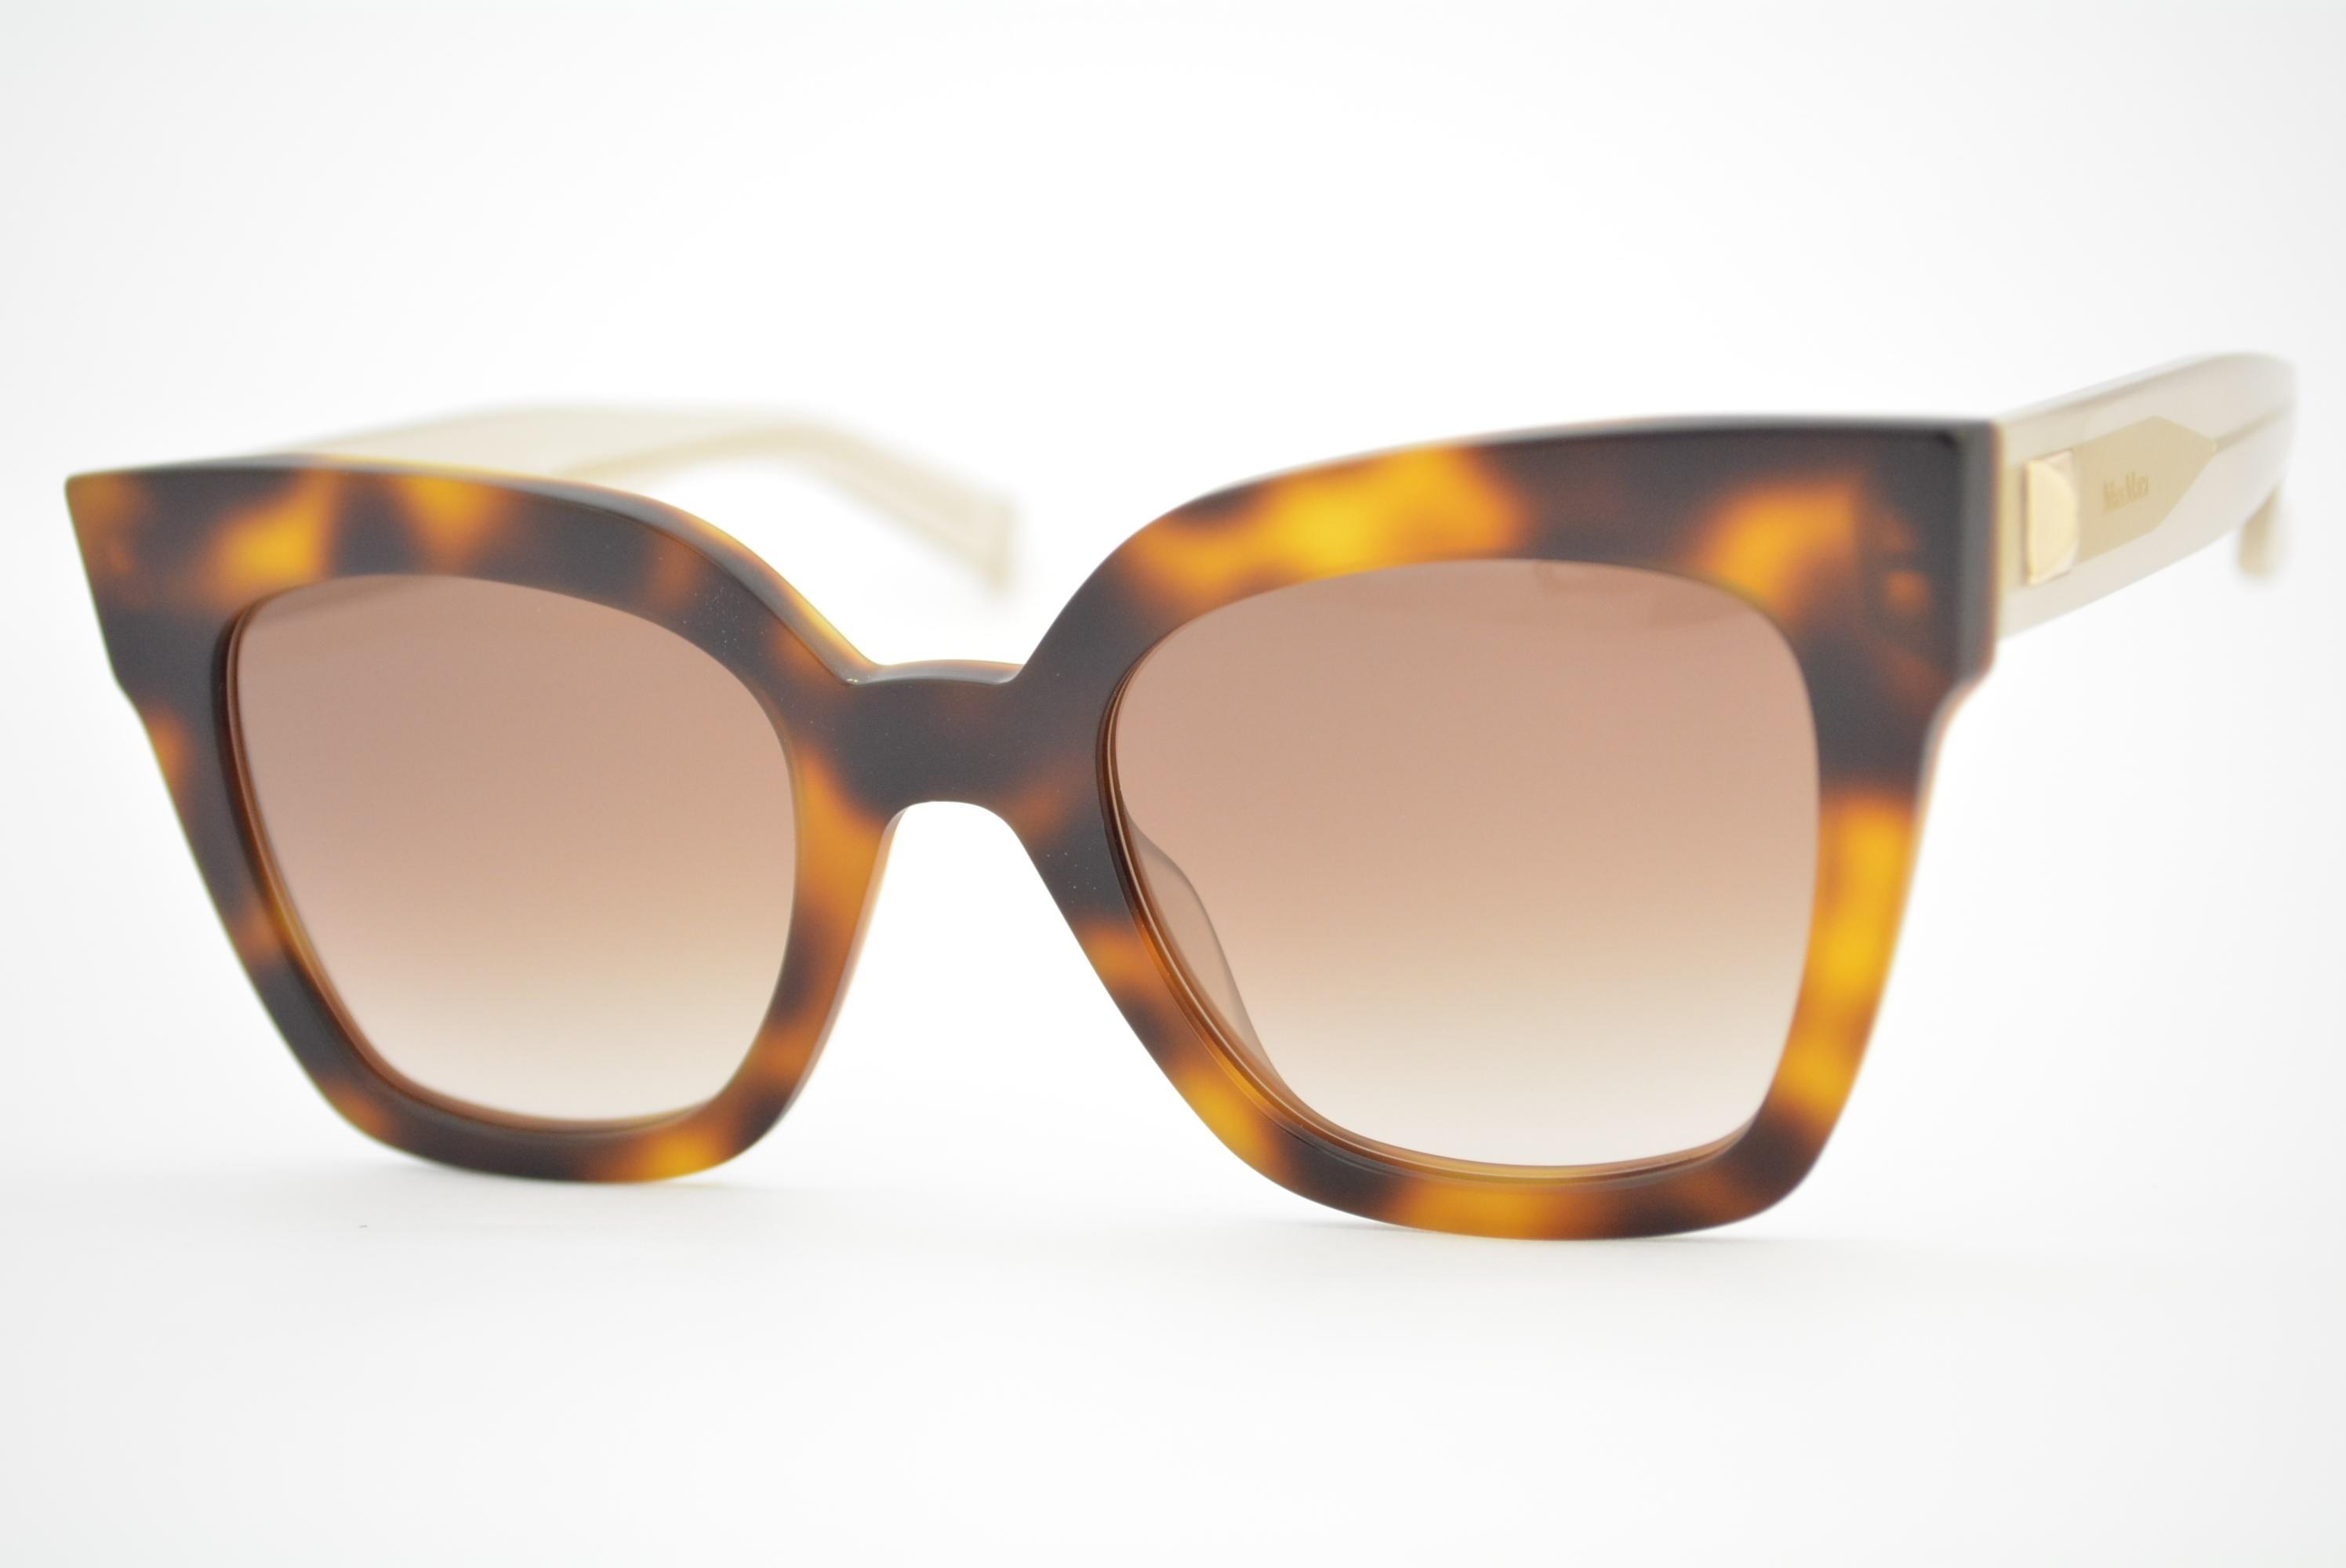 óculos de sol Max Mara mod MM prism IV gxvjd Ótica Cardoso 0edc94f0c1